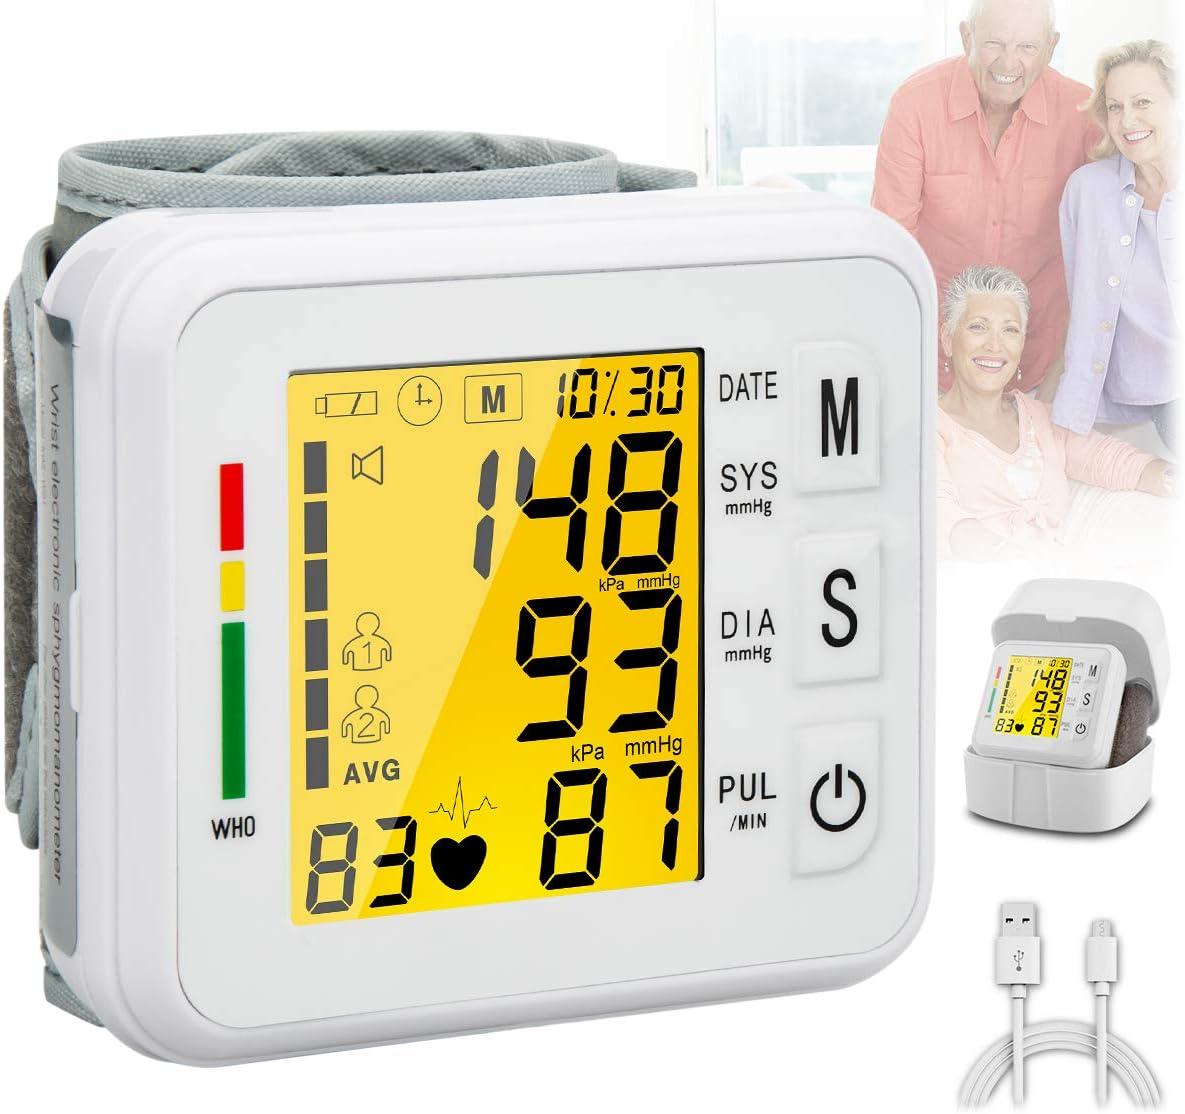 Blood Pressure Monitor,Digital BP Cuff Wrist Blood Pressure Cuff Monitor Automatic Large Backlight Display Rechargeable Wrist Blood Pressure Monitor Pulse Rate Monitoring Meter BP Machine for Home Use